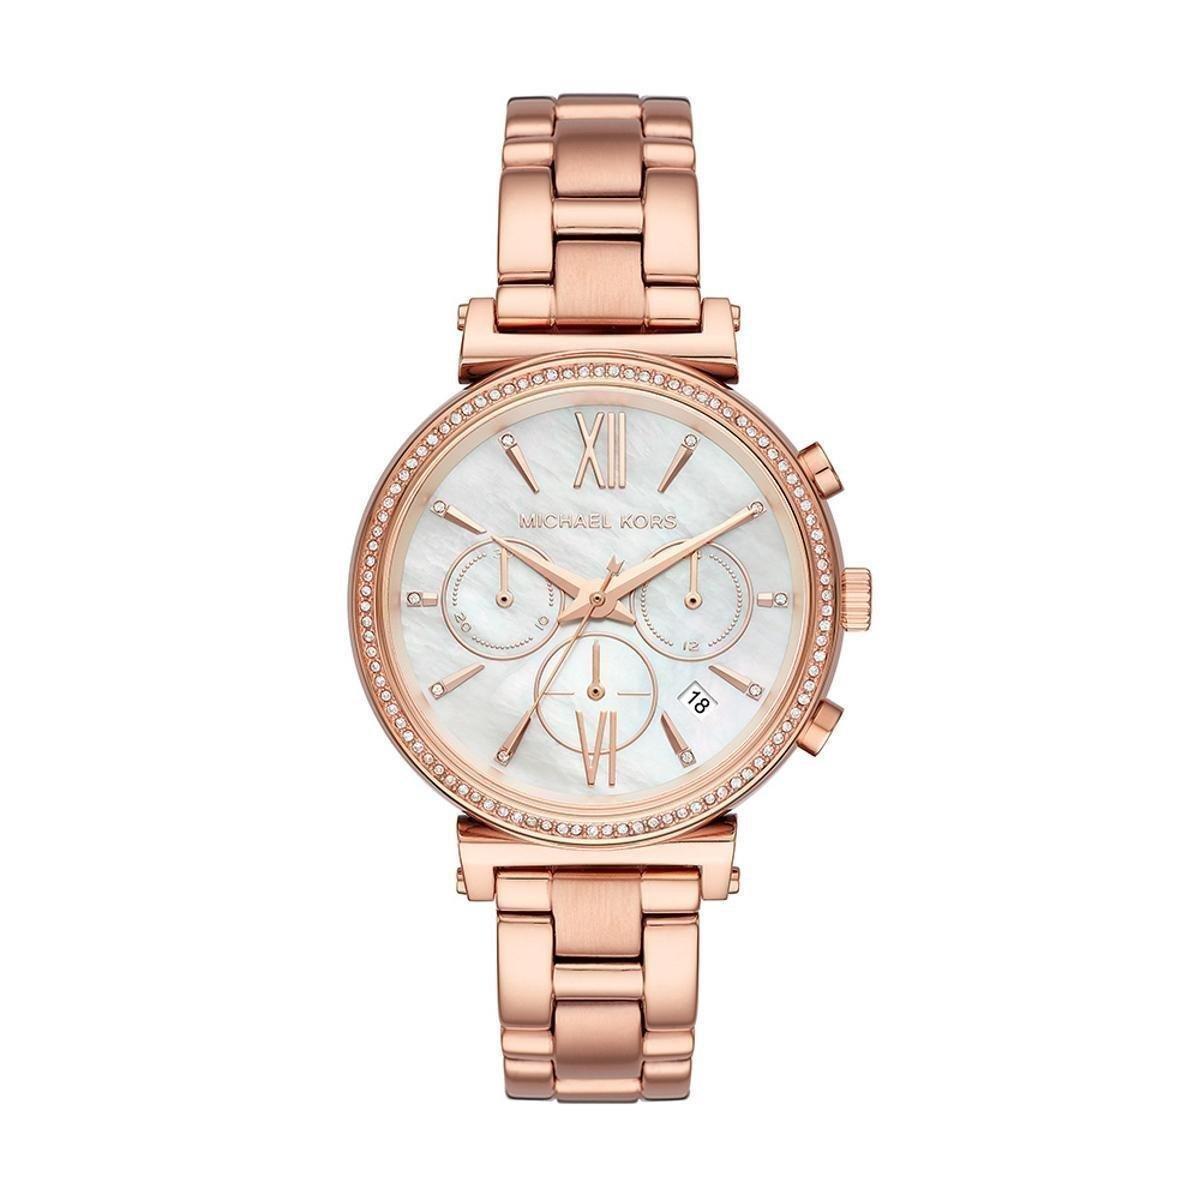 edd4eb8f2ced9 Relógio Michael Kors Feminino Sofie - MK6576 1JN MK6576 1JN - Bronze - Compre  Agora   Zattini